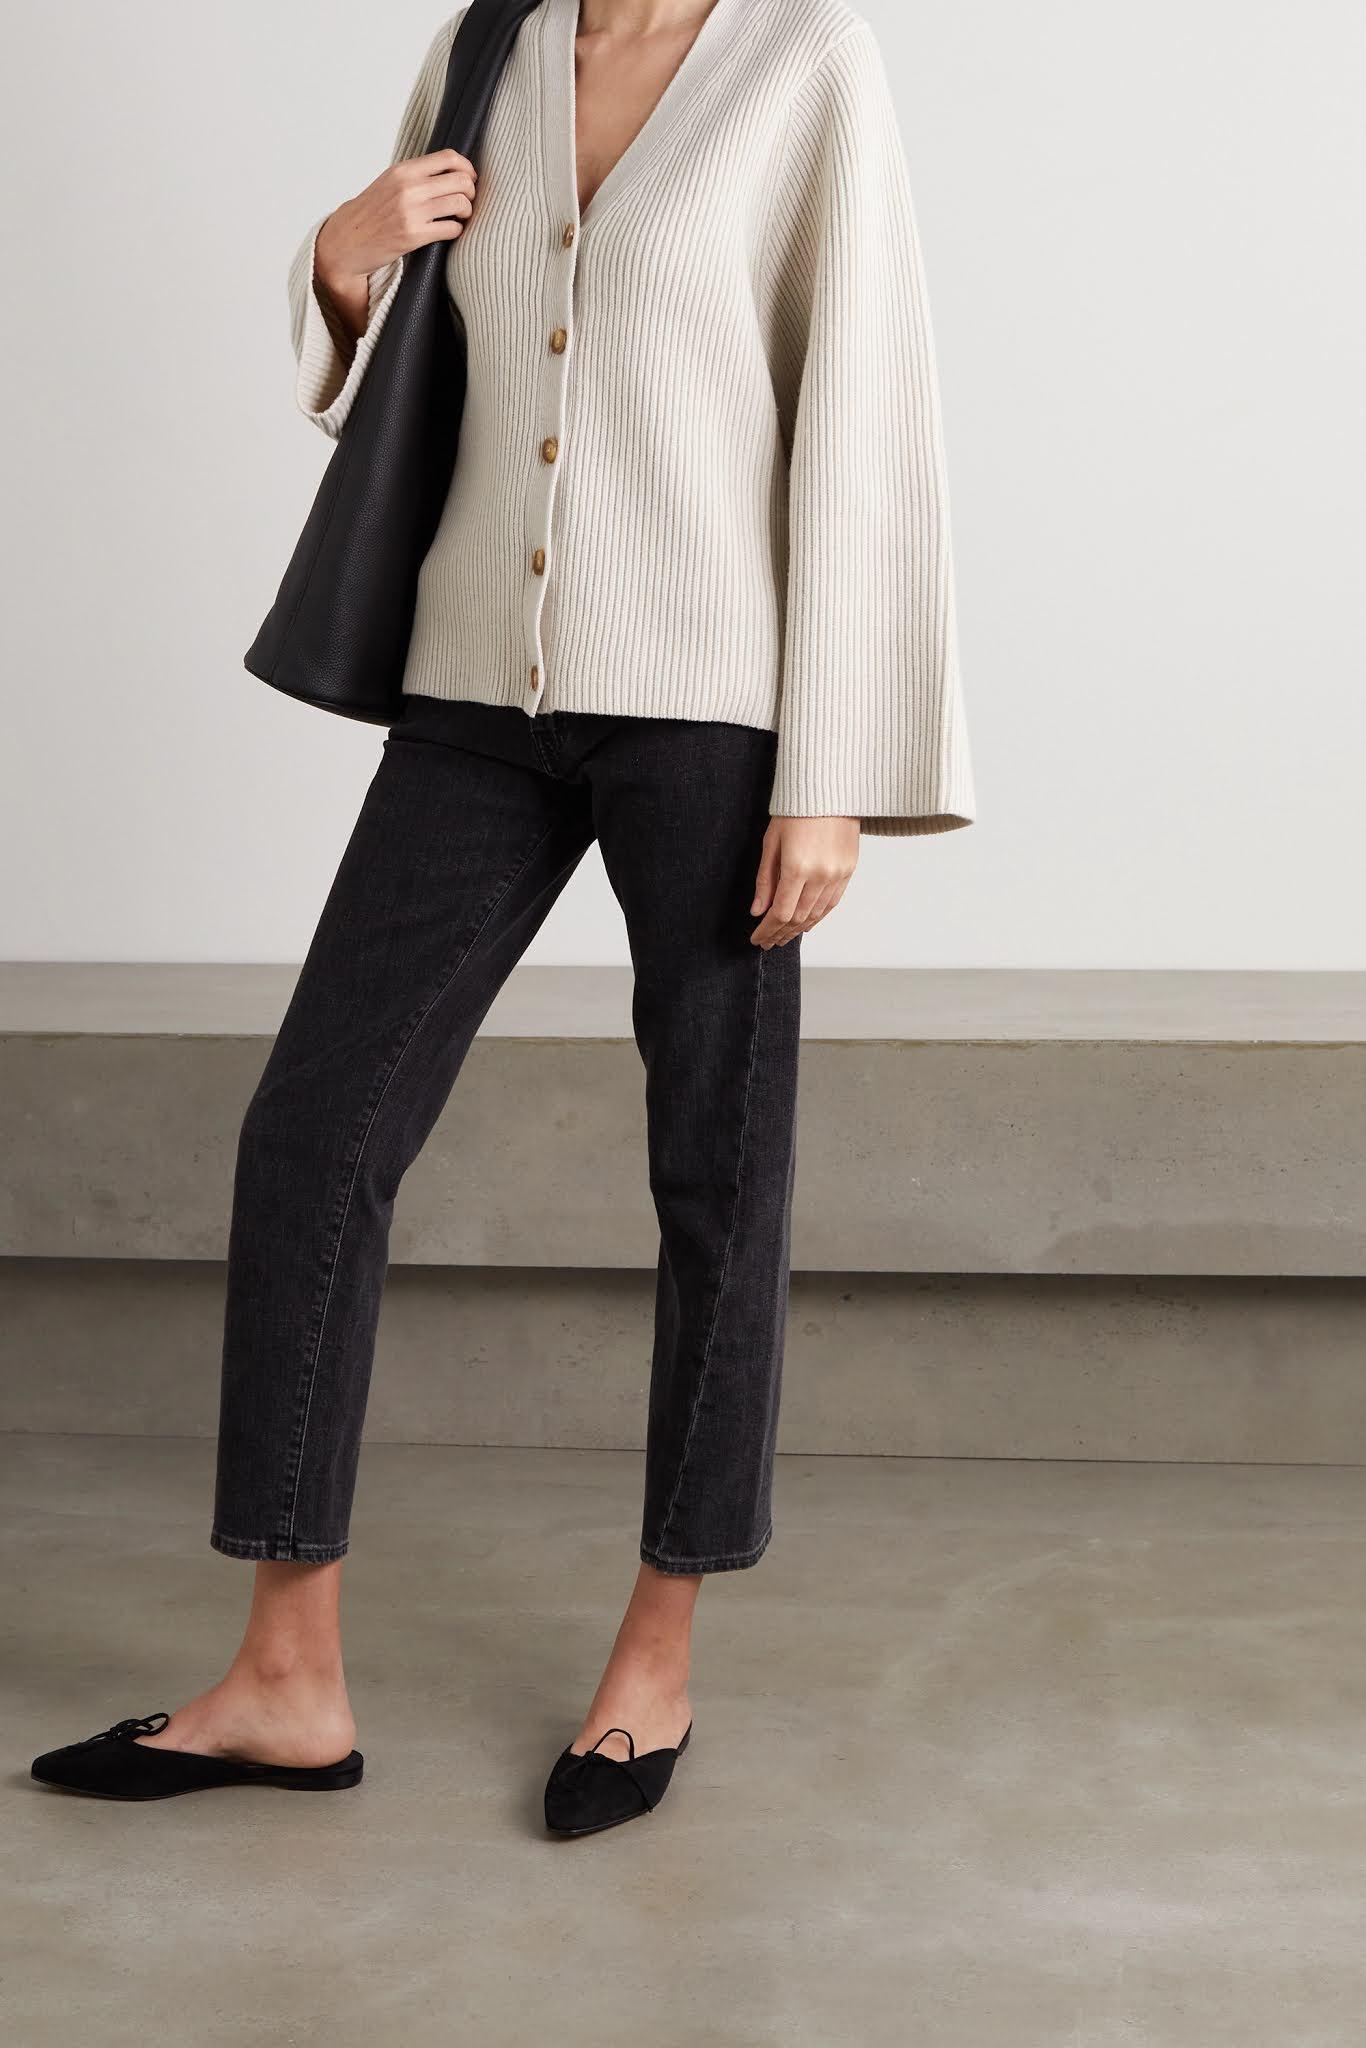 Minimalist Spring Outfit Idea — Toteme neutral cardigan sweater, faded black jeans, and Manolo Blahnik Ballerimu mule flats